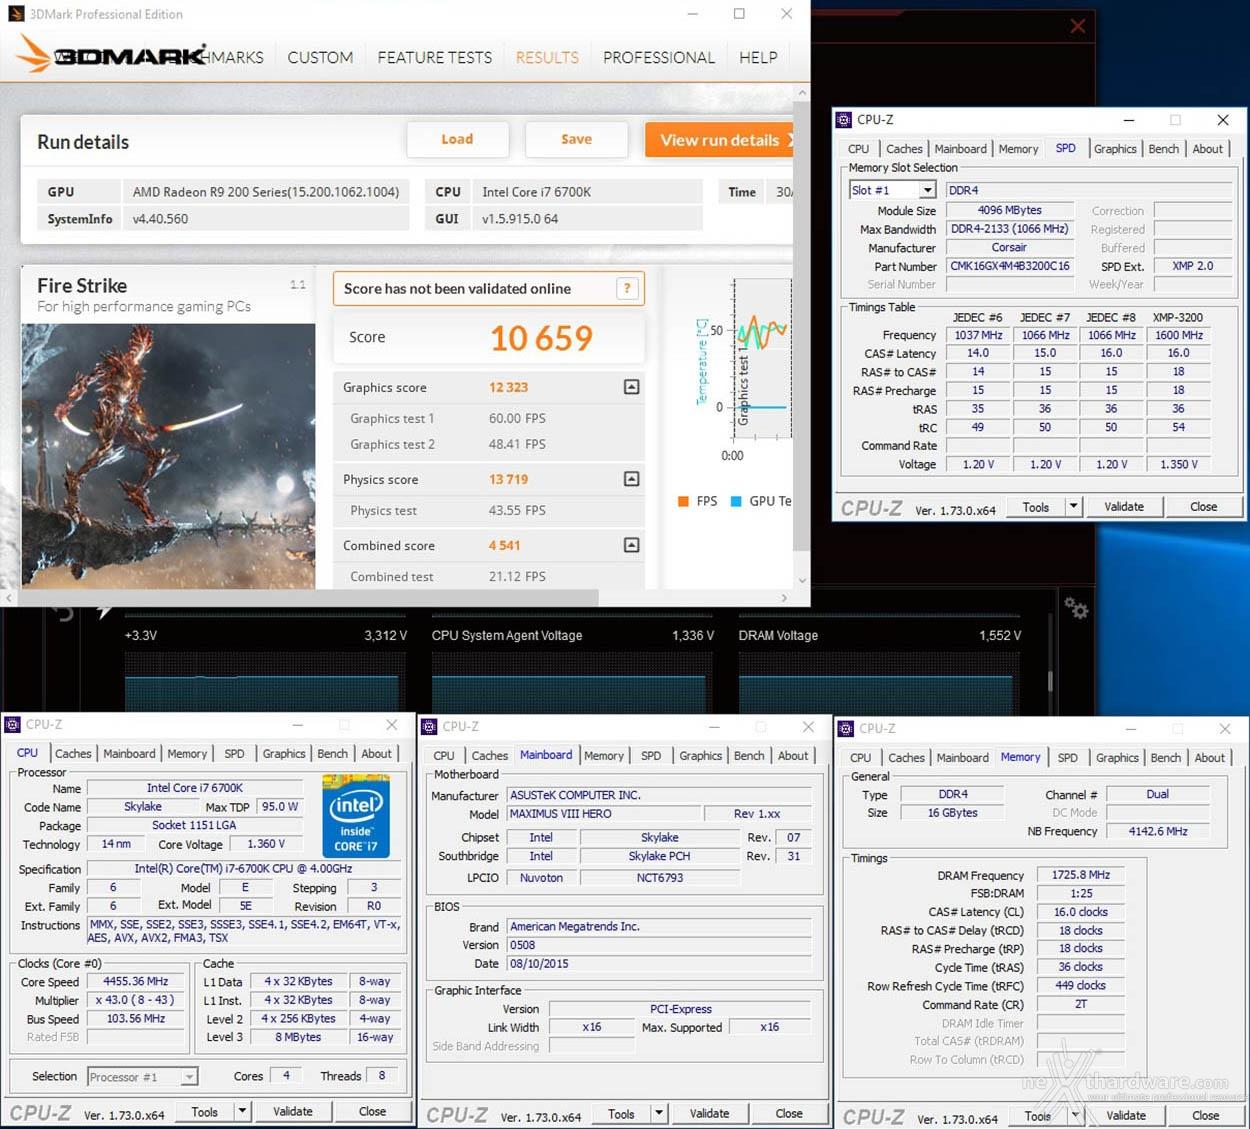 Corsair Vengeance DDR4 LPX 3200MHz 16GB | 9  Overclock